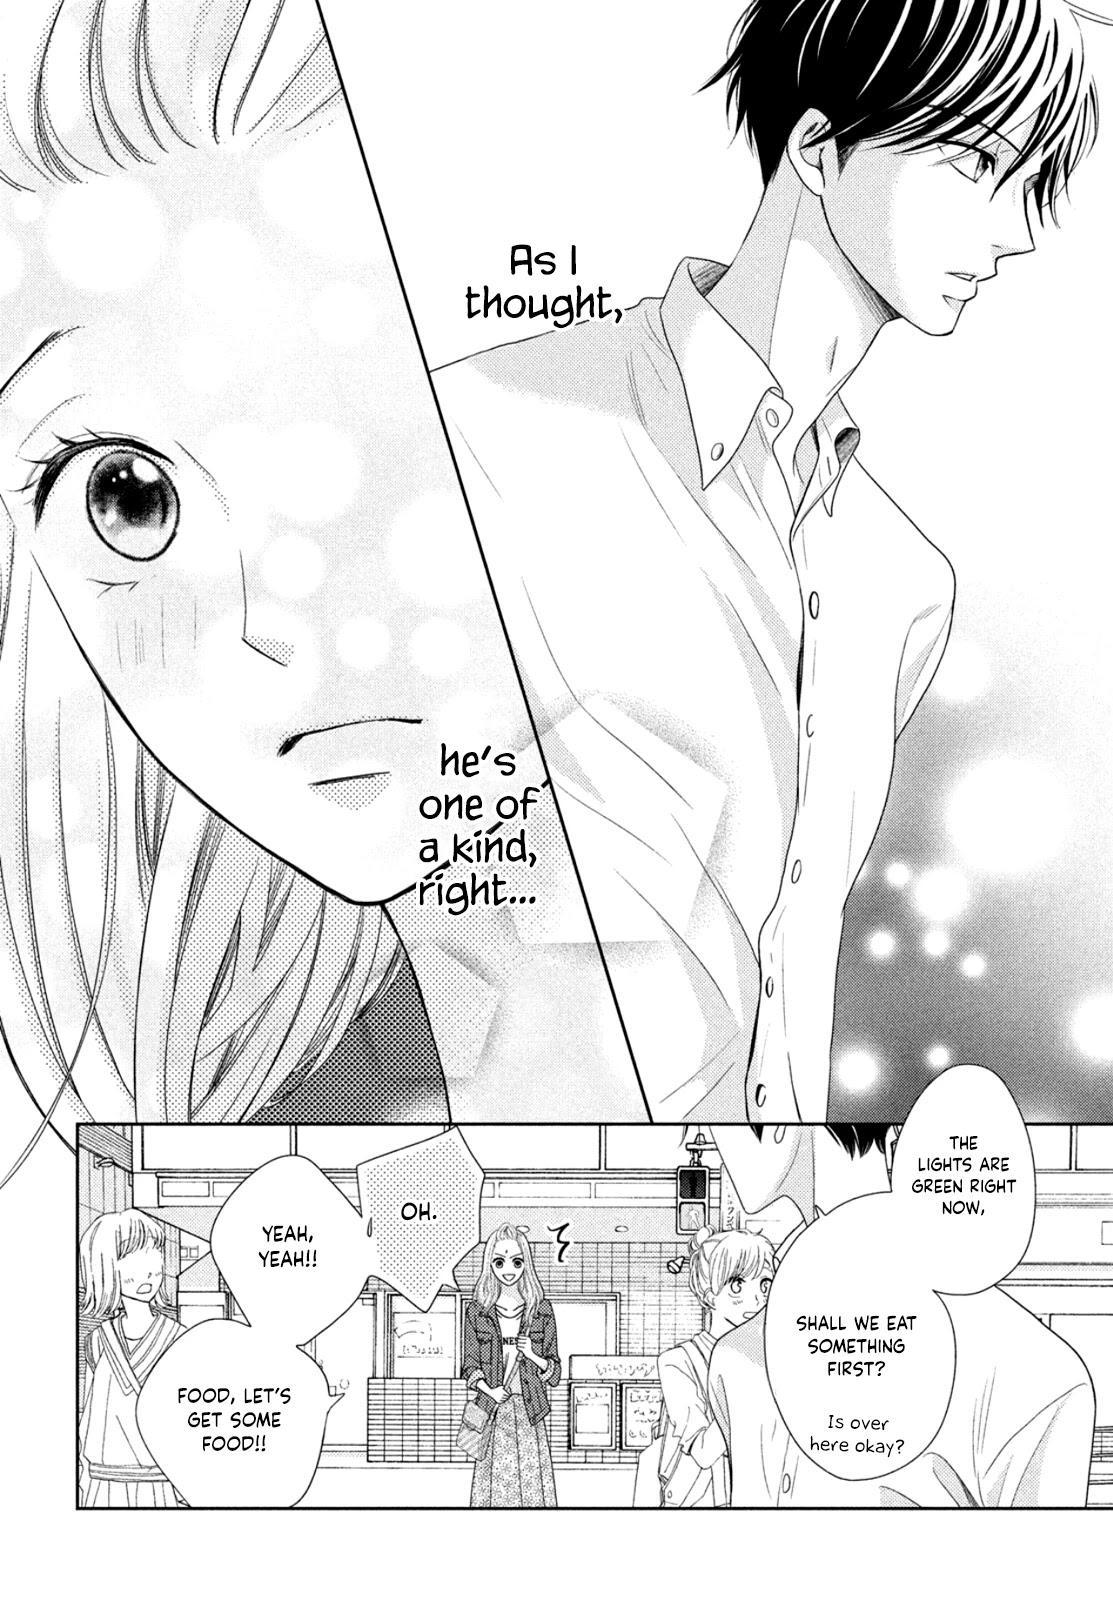 Arashi-Kun No Dakimakura Chapter 7: Because We're The Same page 12 - Mangakakalots.com